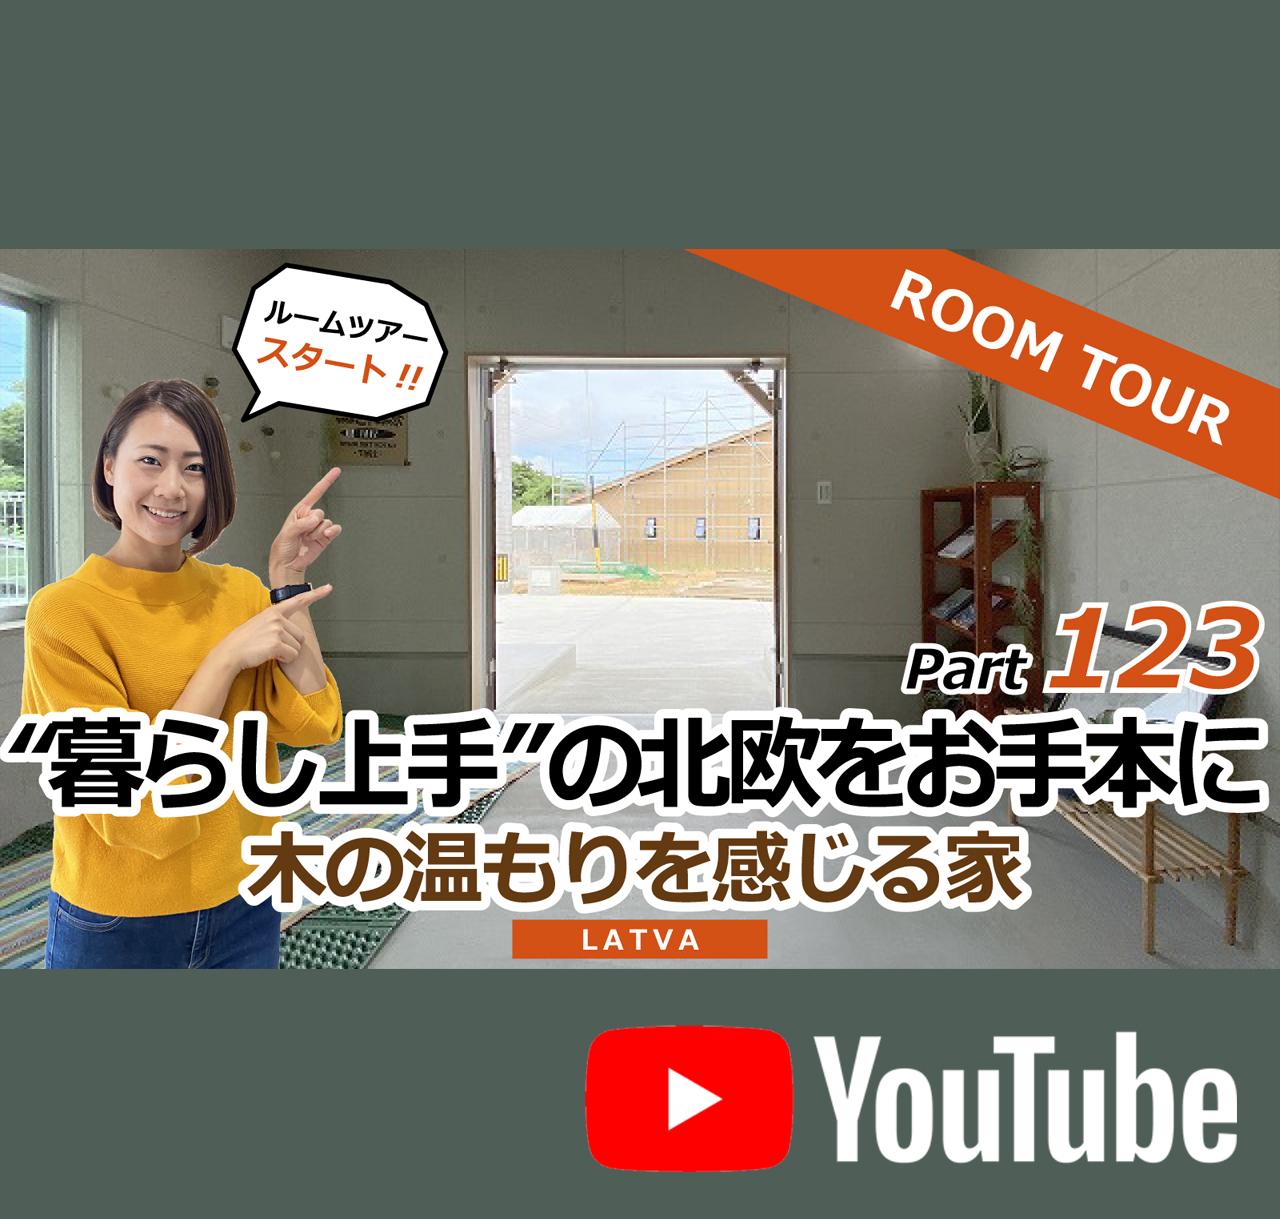 Youtube限定!WEB見学会 LATVA <!--赤道ハイツ2-->